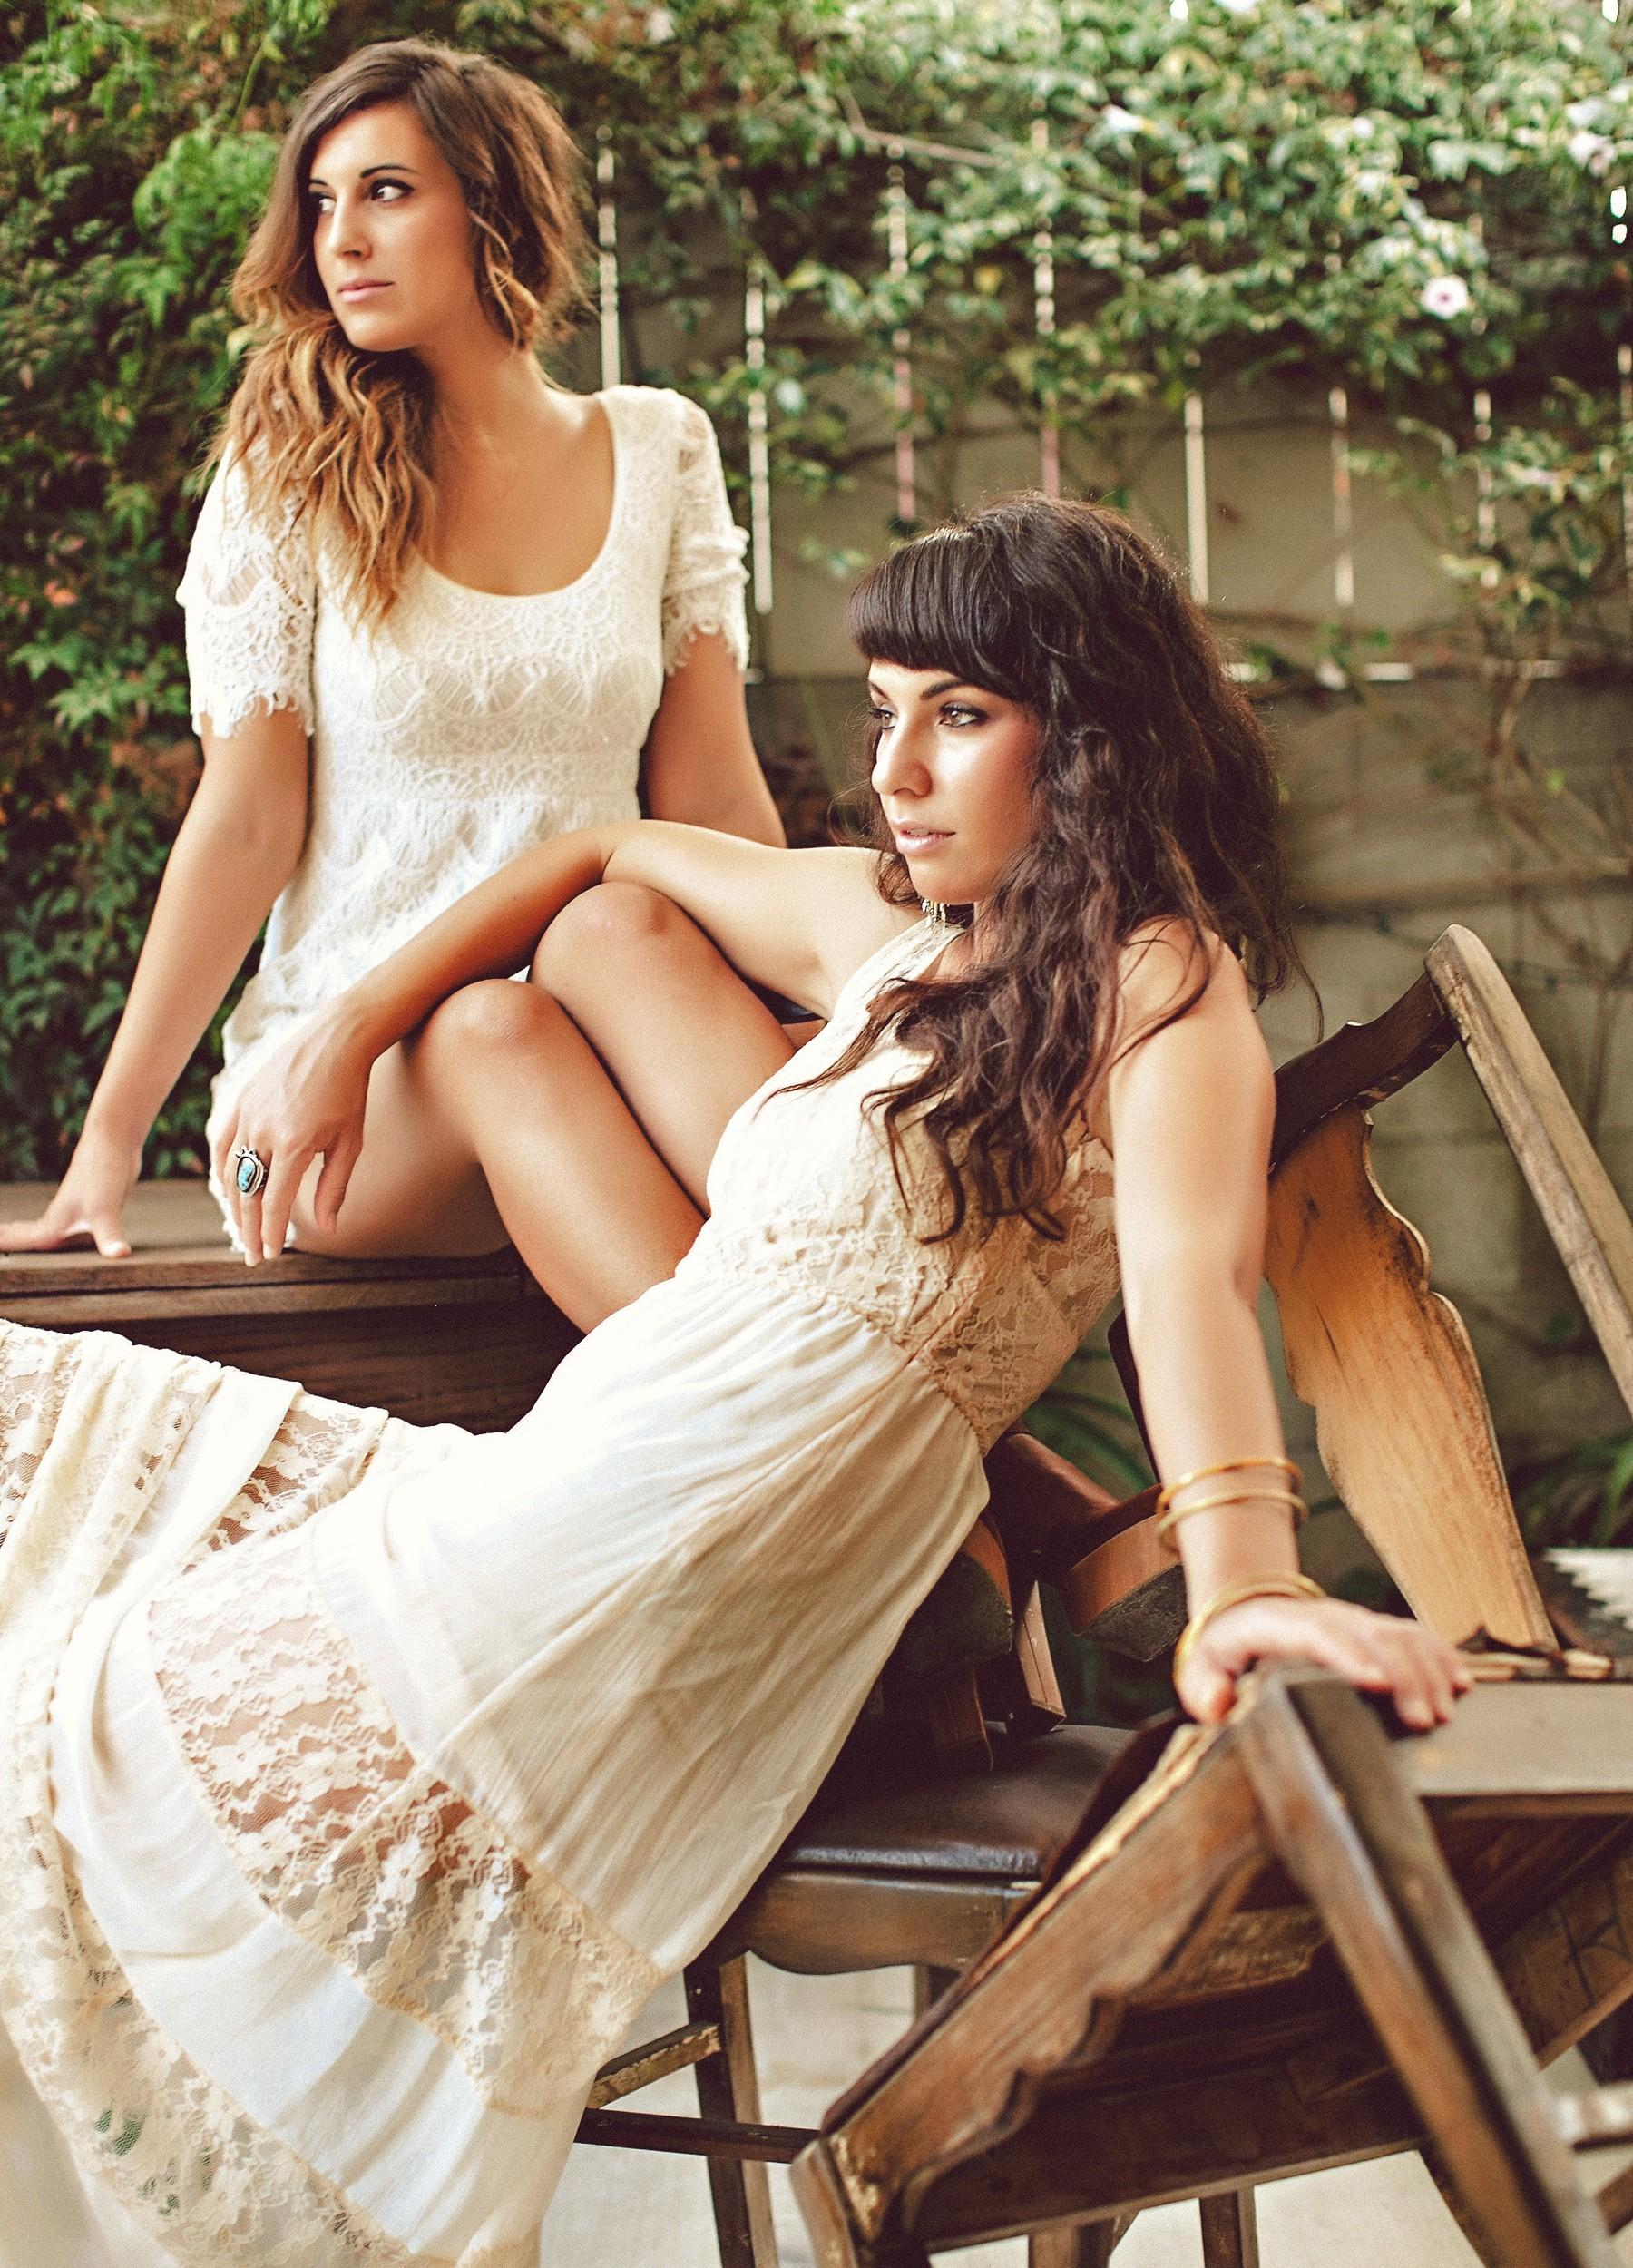 backyard-boudoir-diva-photo-shoot-2